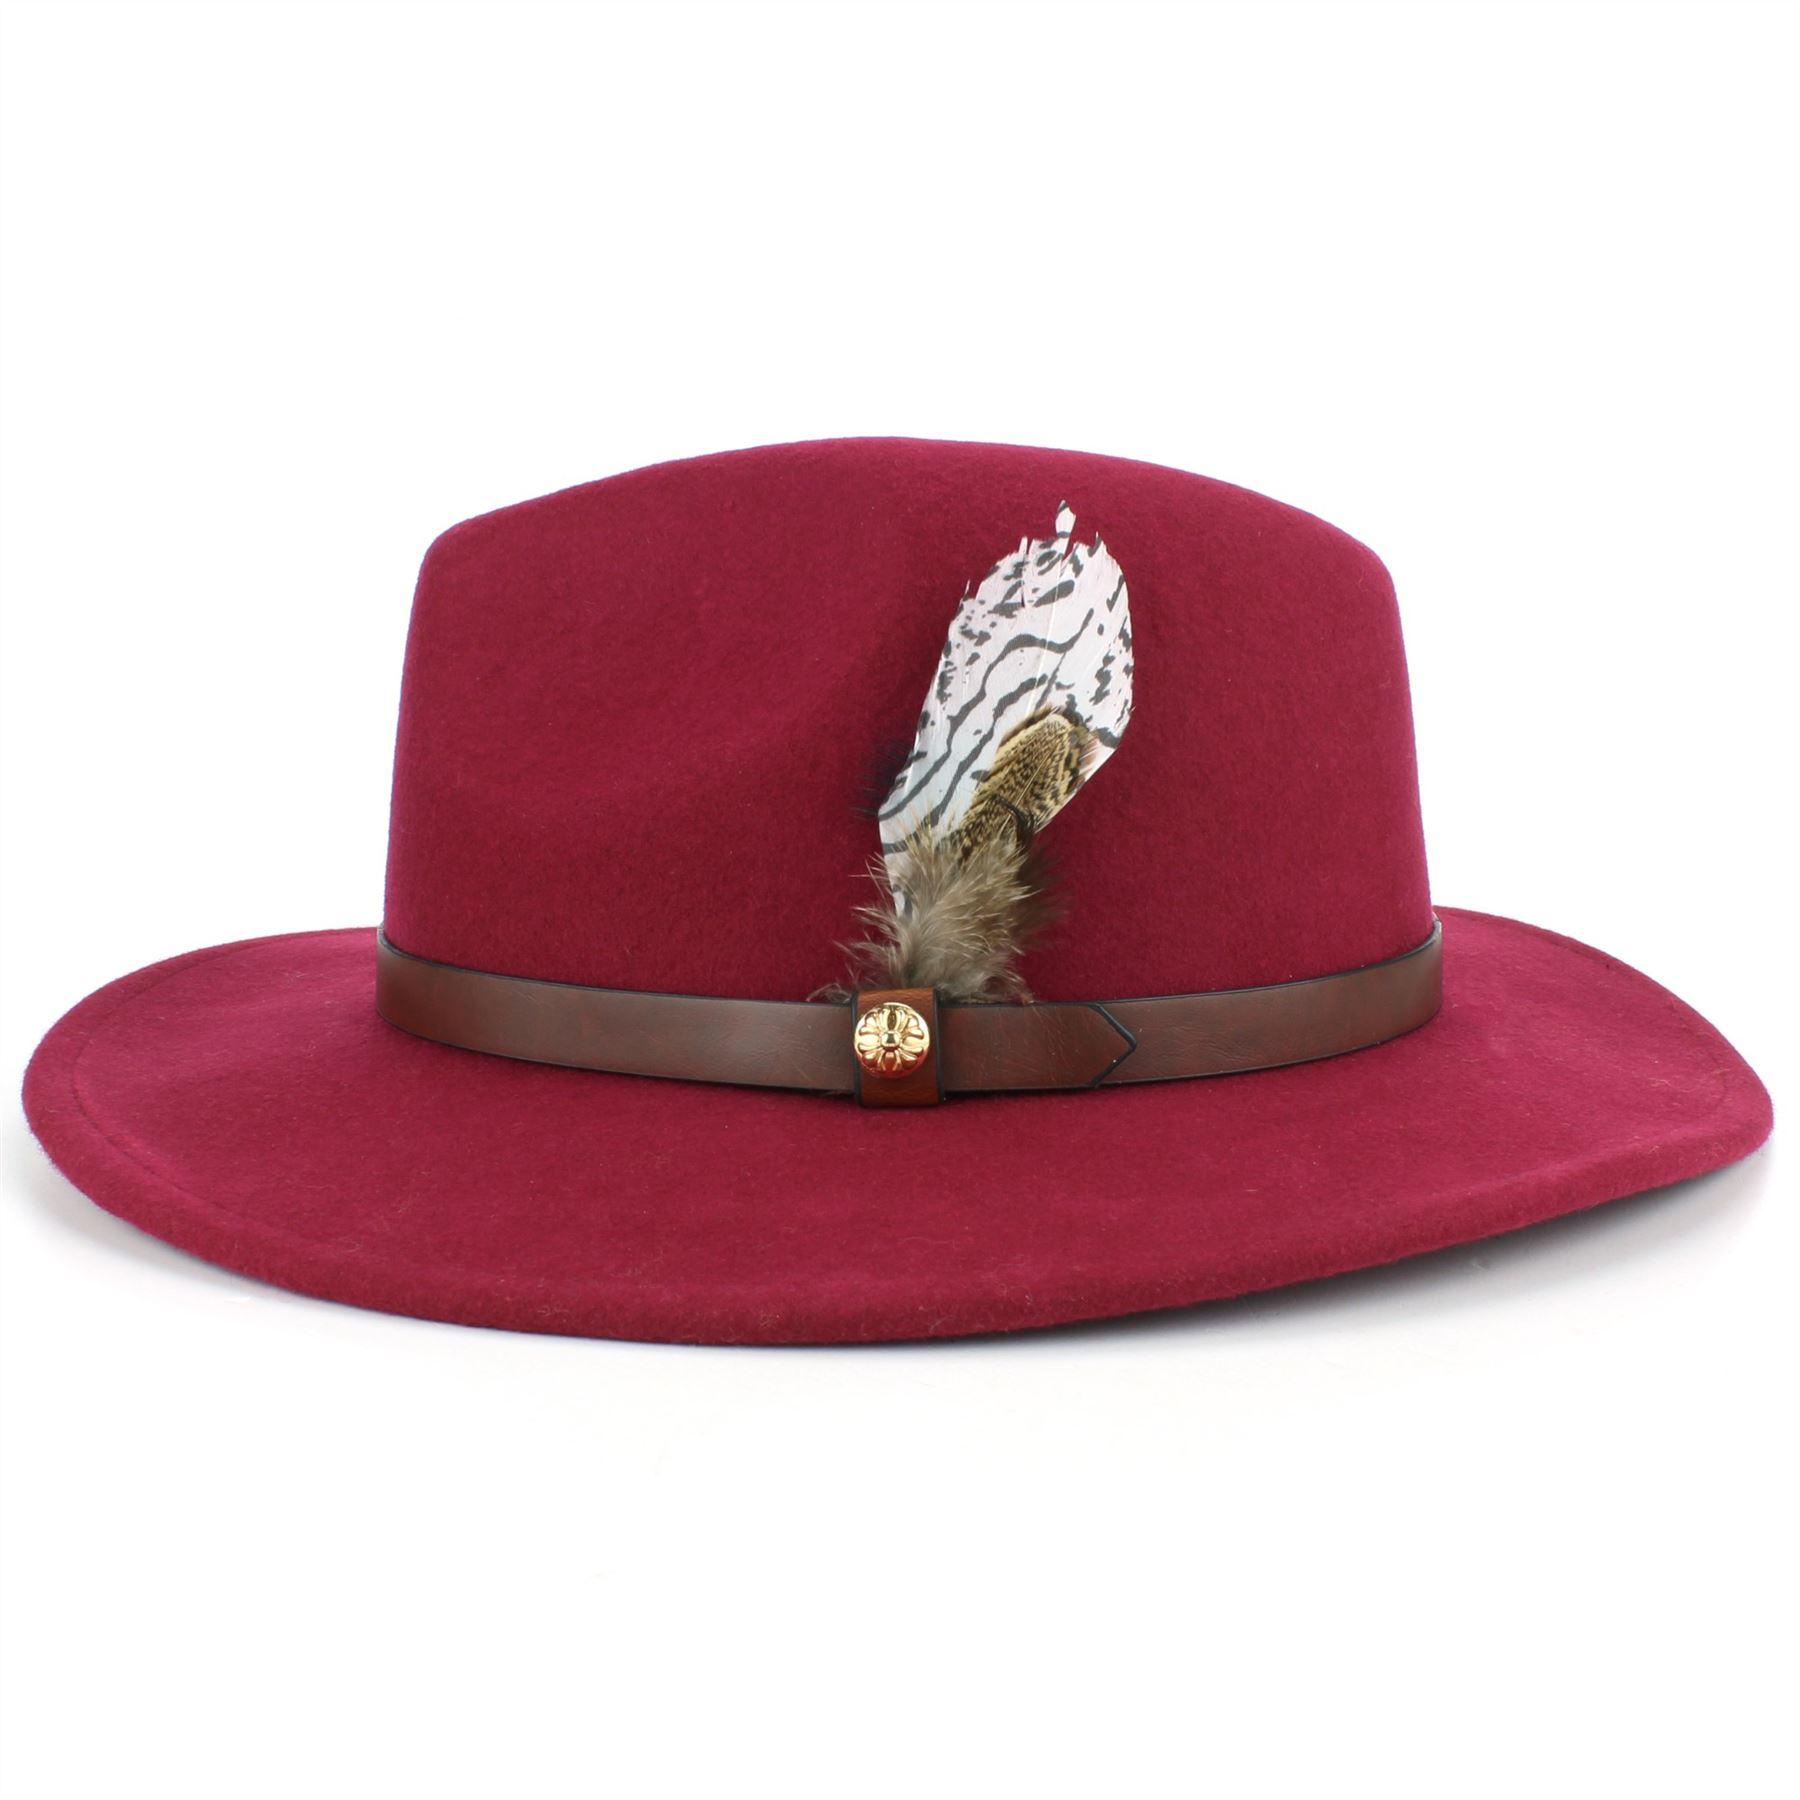 Fedora-Hat-Wool-Felt-Hawkins-Feather-Band-Trilby-Ladies-Men-Travel-Brim-Travel thumbnail 24